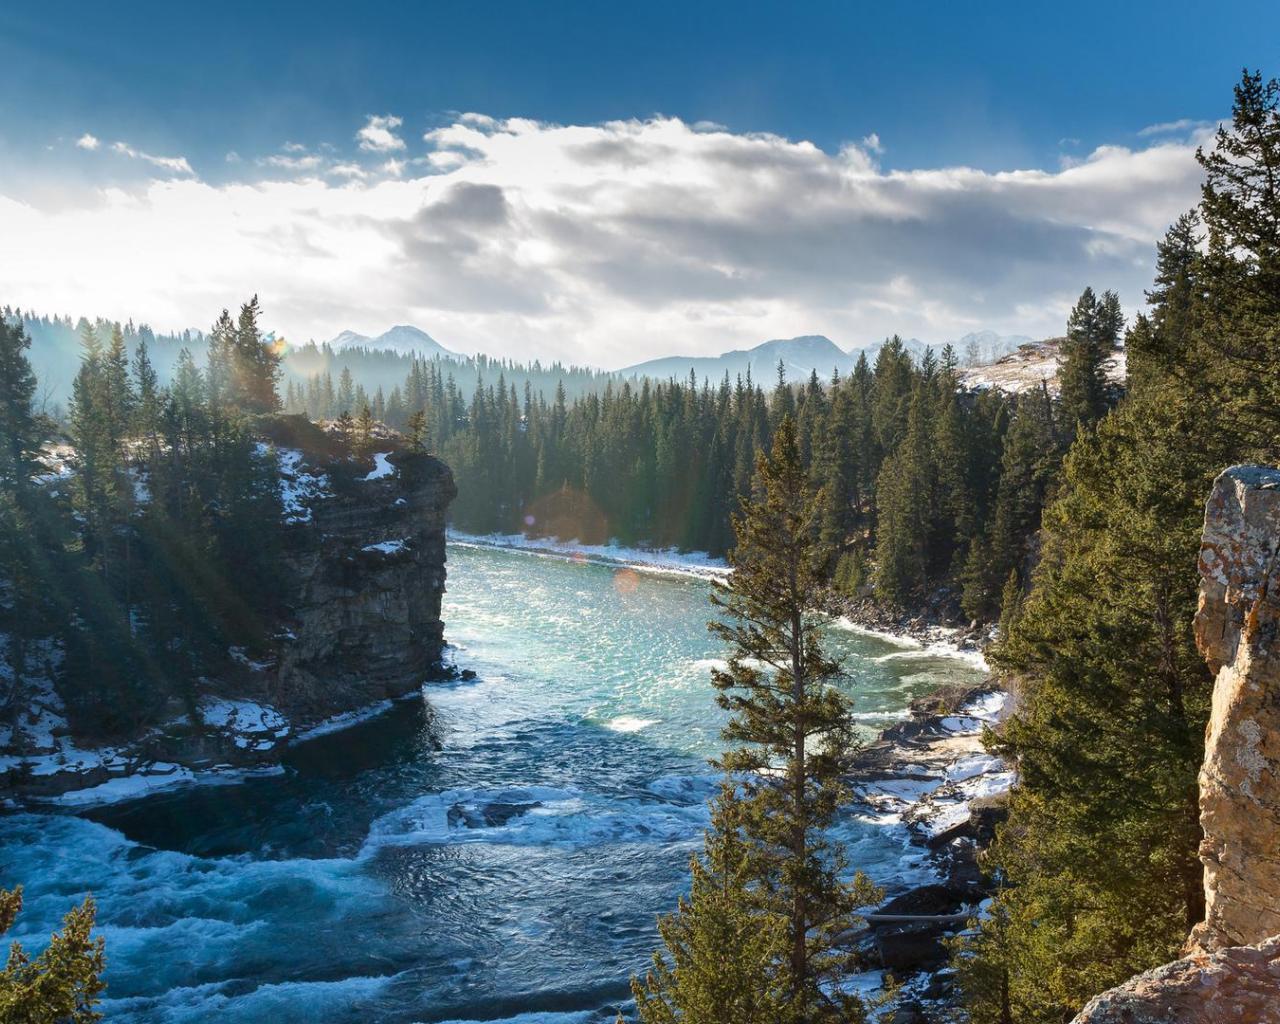 Gorgeous bow river in alberta canada HQ WALLPAPER 125279 1280x1024